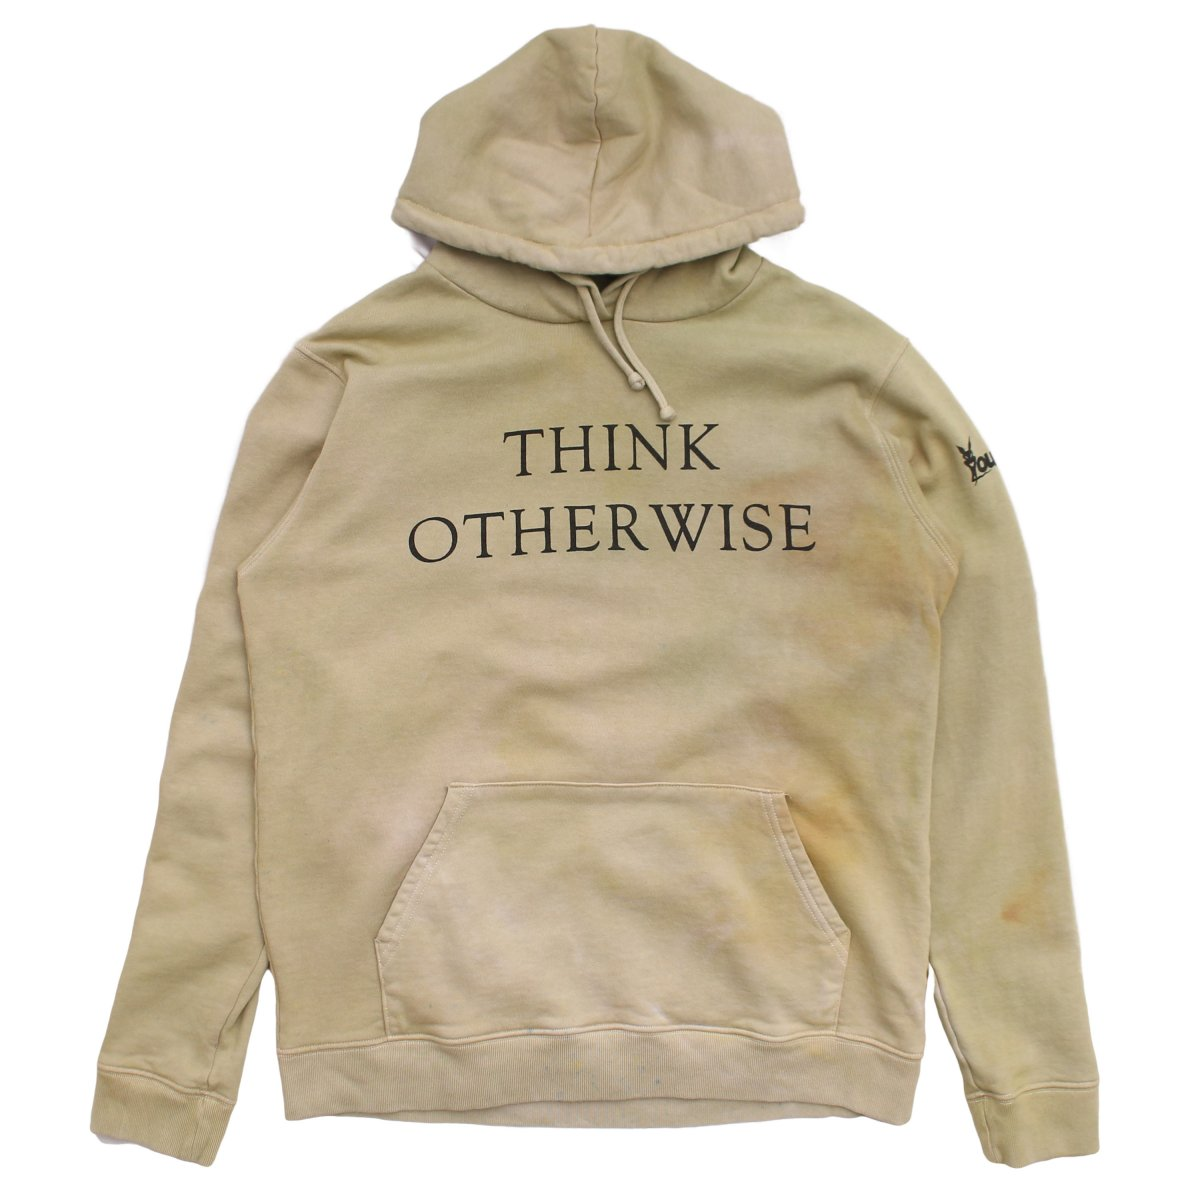 Savege Capitalism dyed Hoodie(1 of 1)